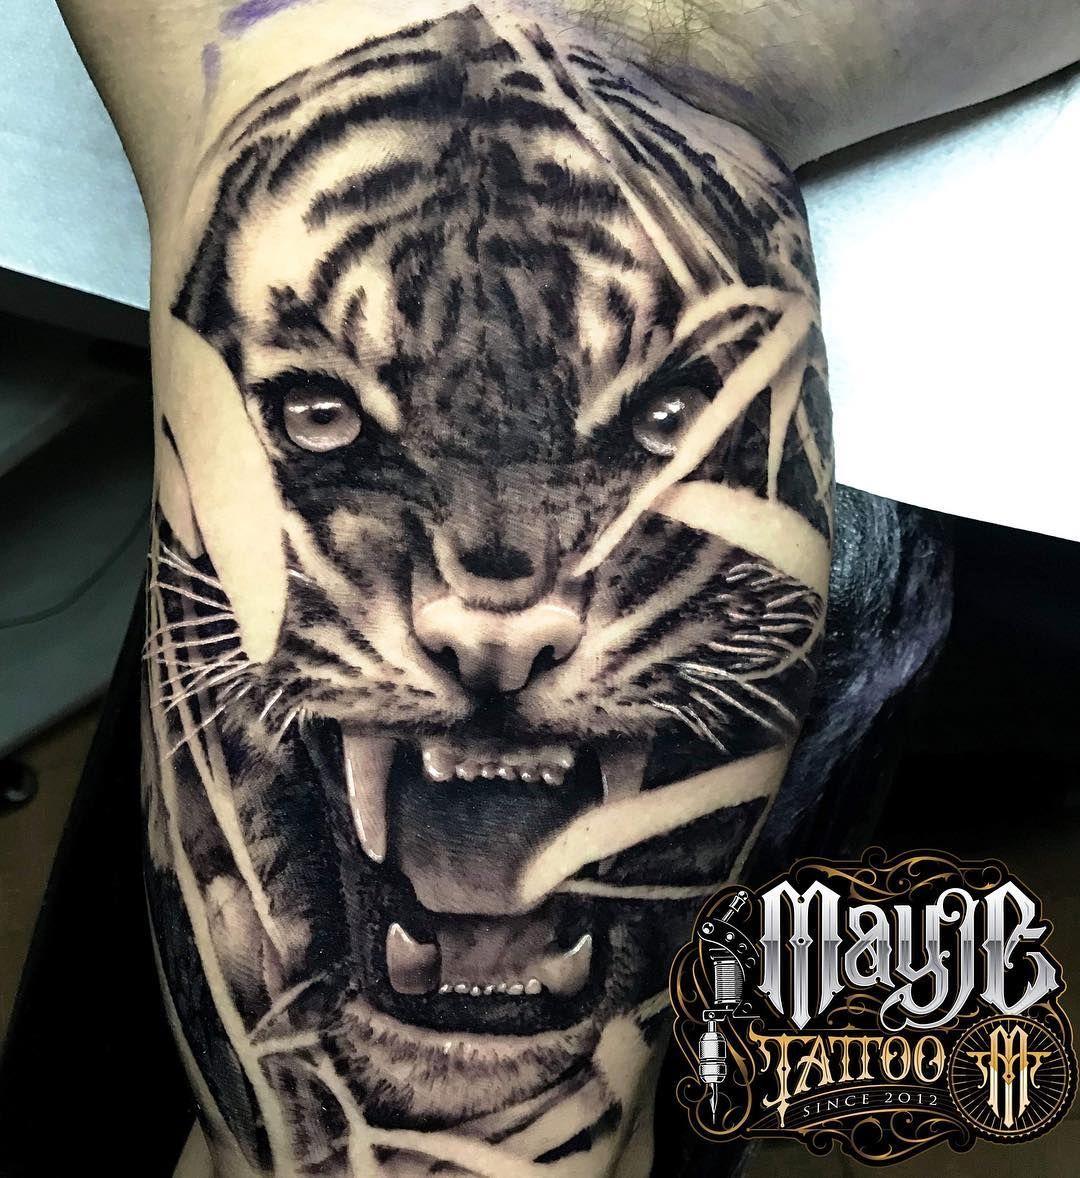 Último Tigre del año 😊 🐯  @blackscorpionink  @bluebirdneedles  @nuclearwhiteink  @blueicetattoocream  #mayjetattoo #tigre #tiger #tigretattoo #tattoo #ink #tatuaje #realistictattoo #realismotattoo #tigretattoo #blackandwhite #bcntattoo #barcelonatattoo #tattoos #terrassatattoo